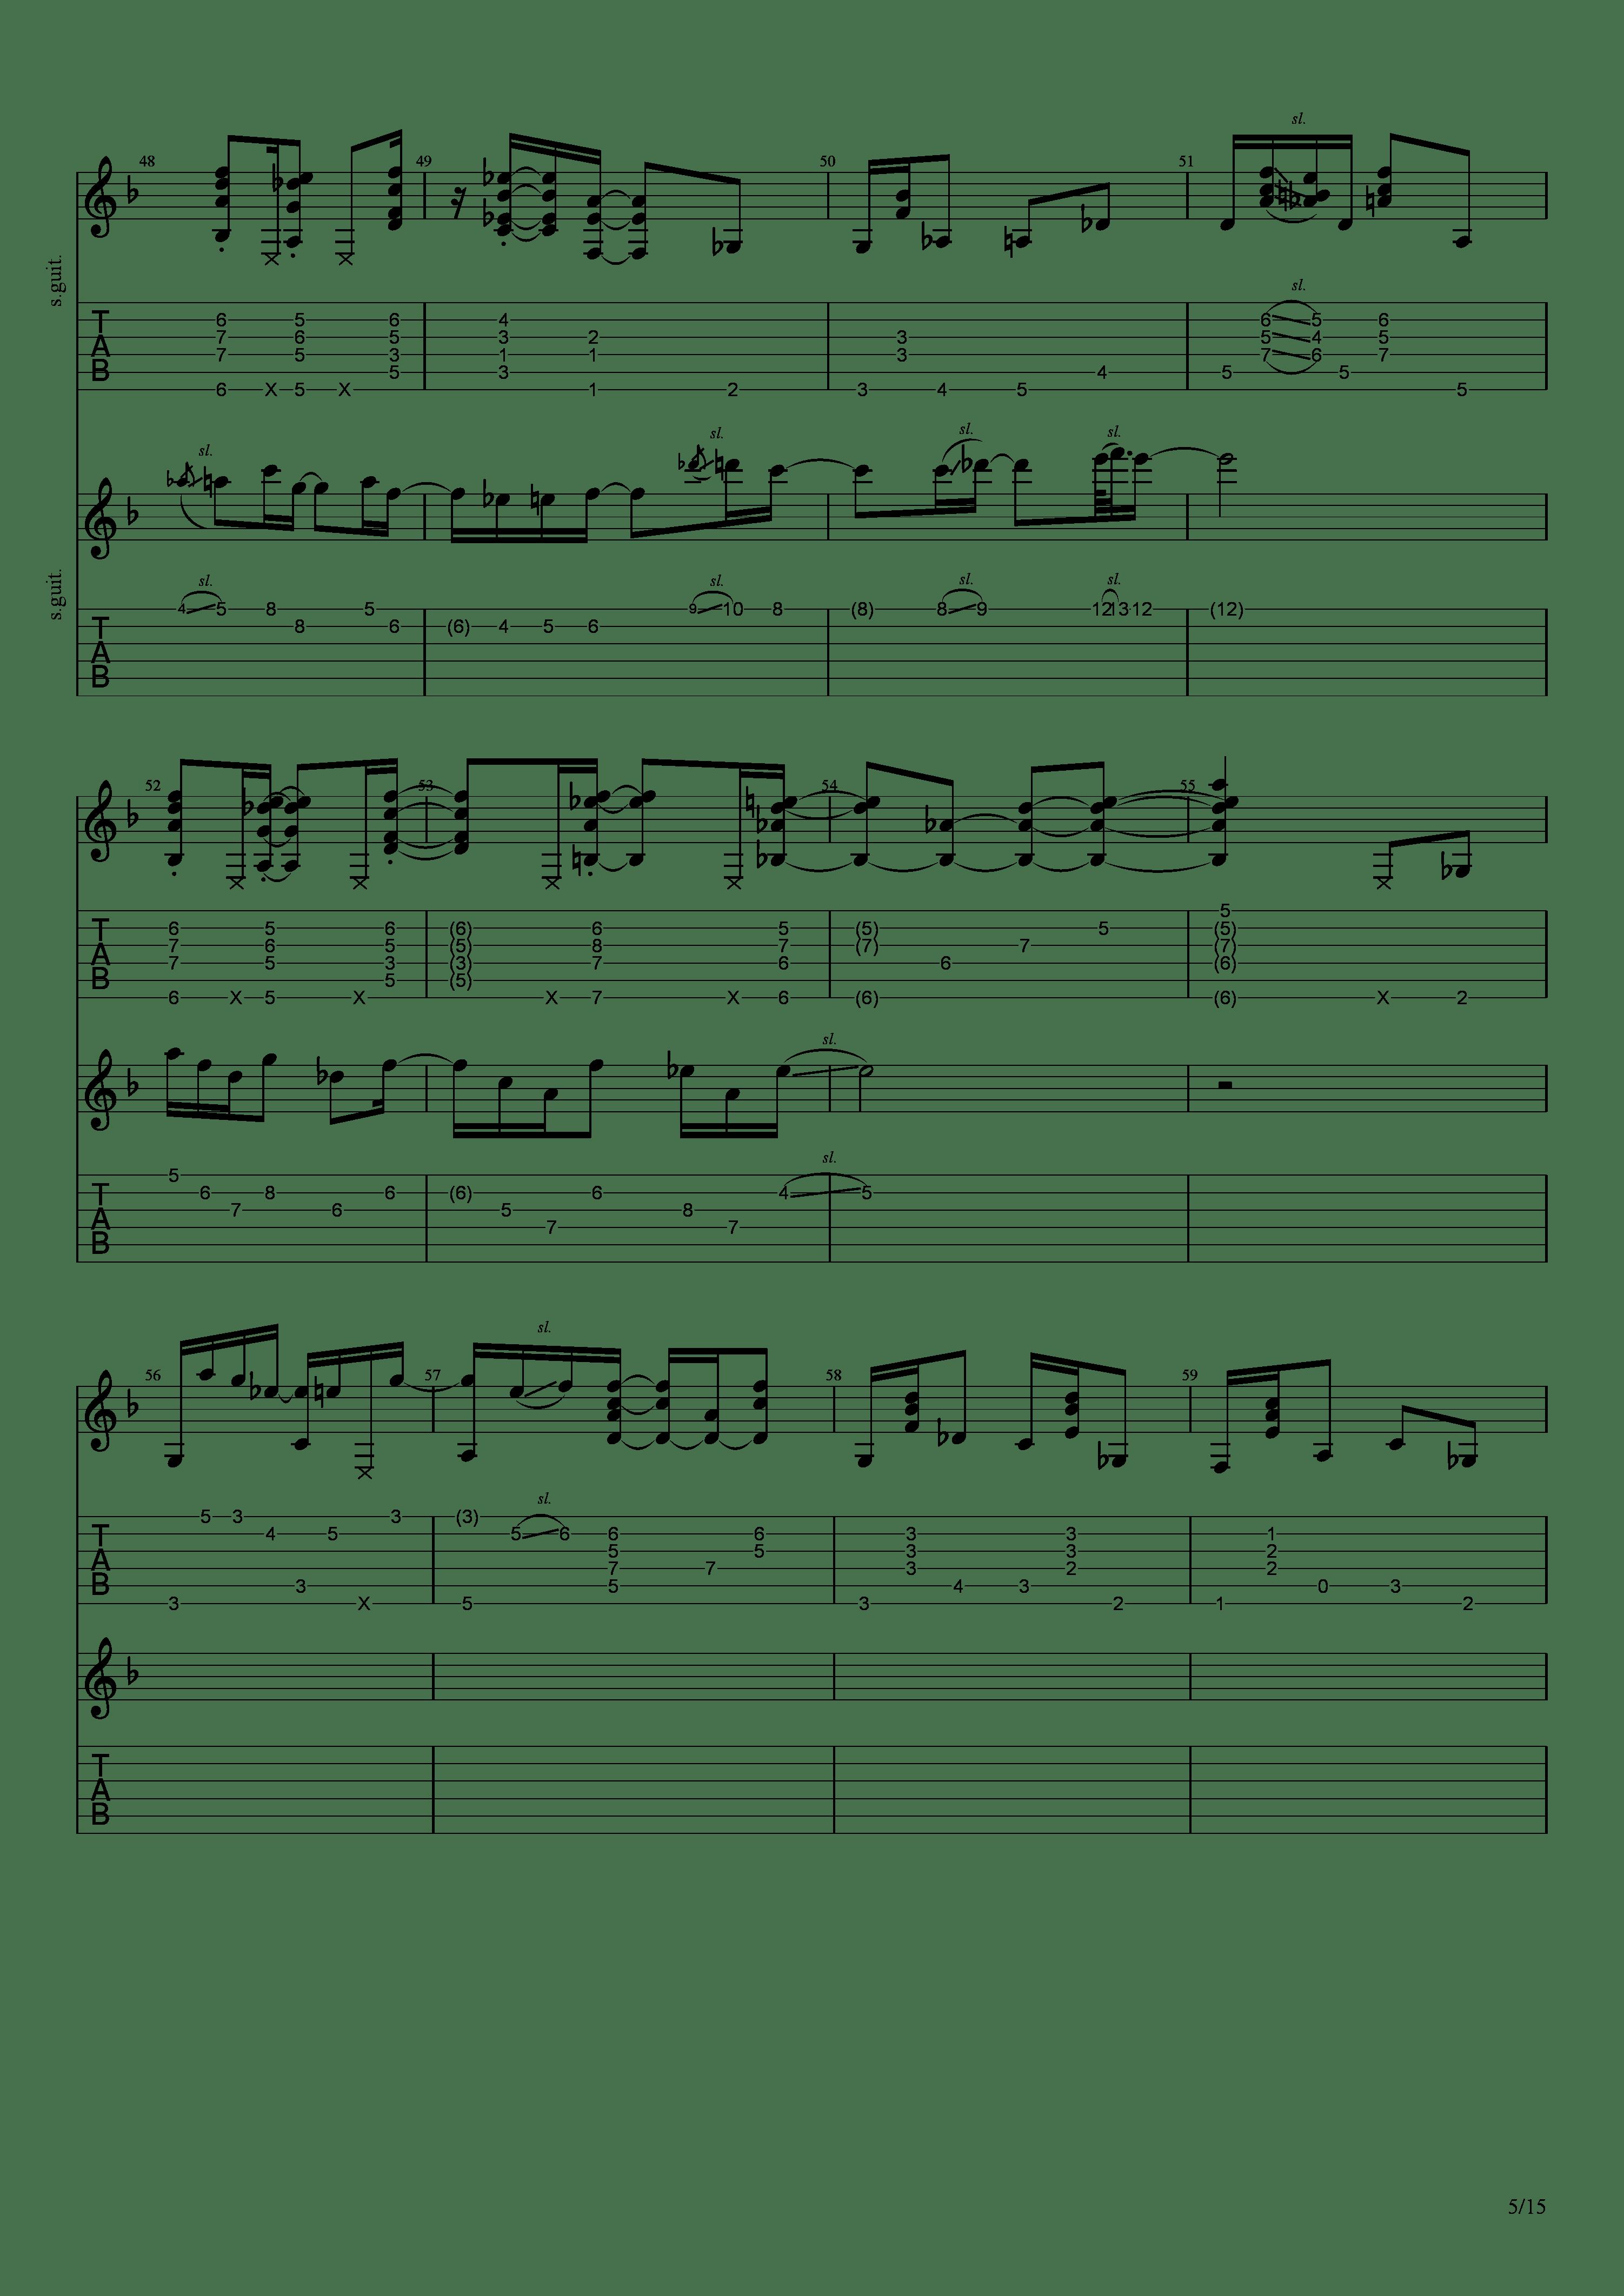 Labyrinth (松井佑贵&井草圣二)吉他谱5